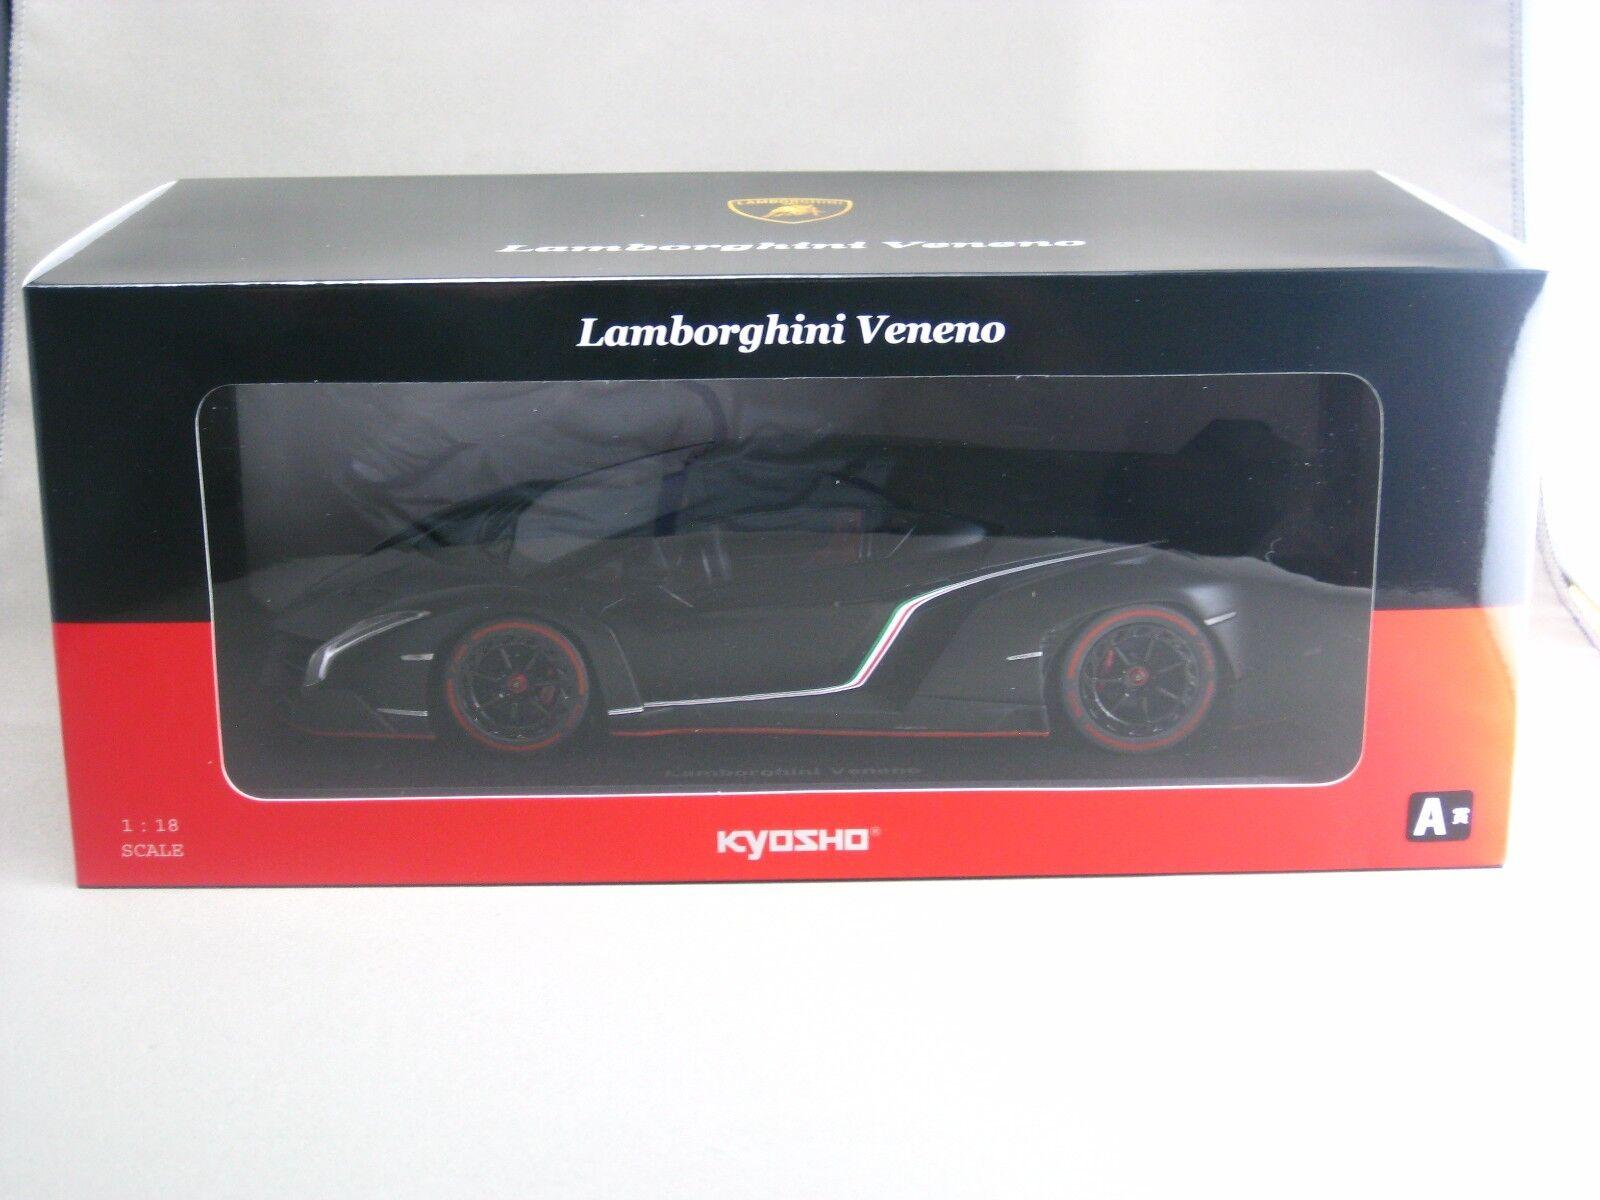 Lamborghini Veneno Black Kyosho 1 18 Diecast Model Car A Award